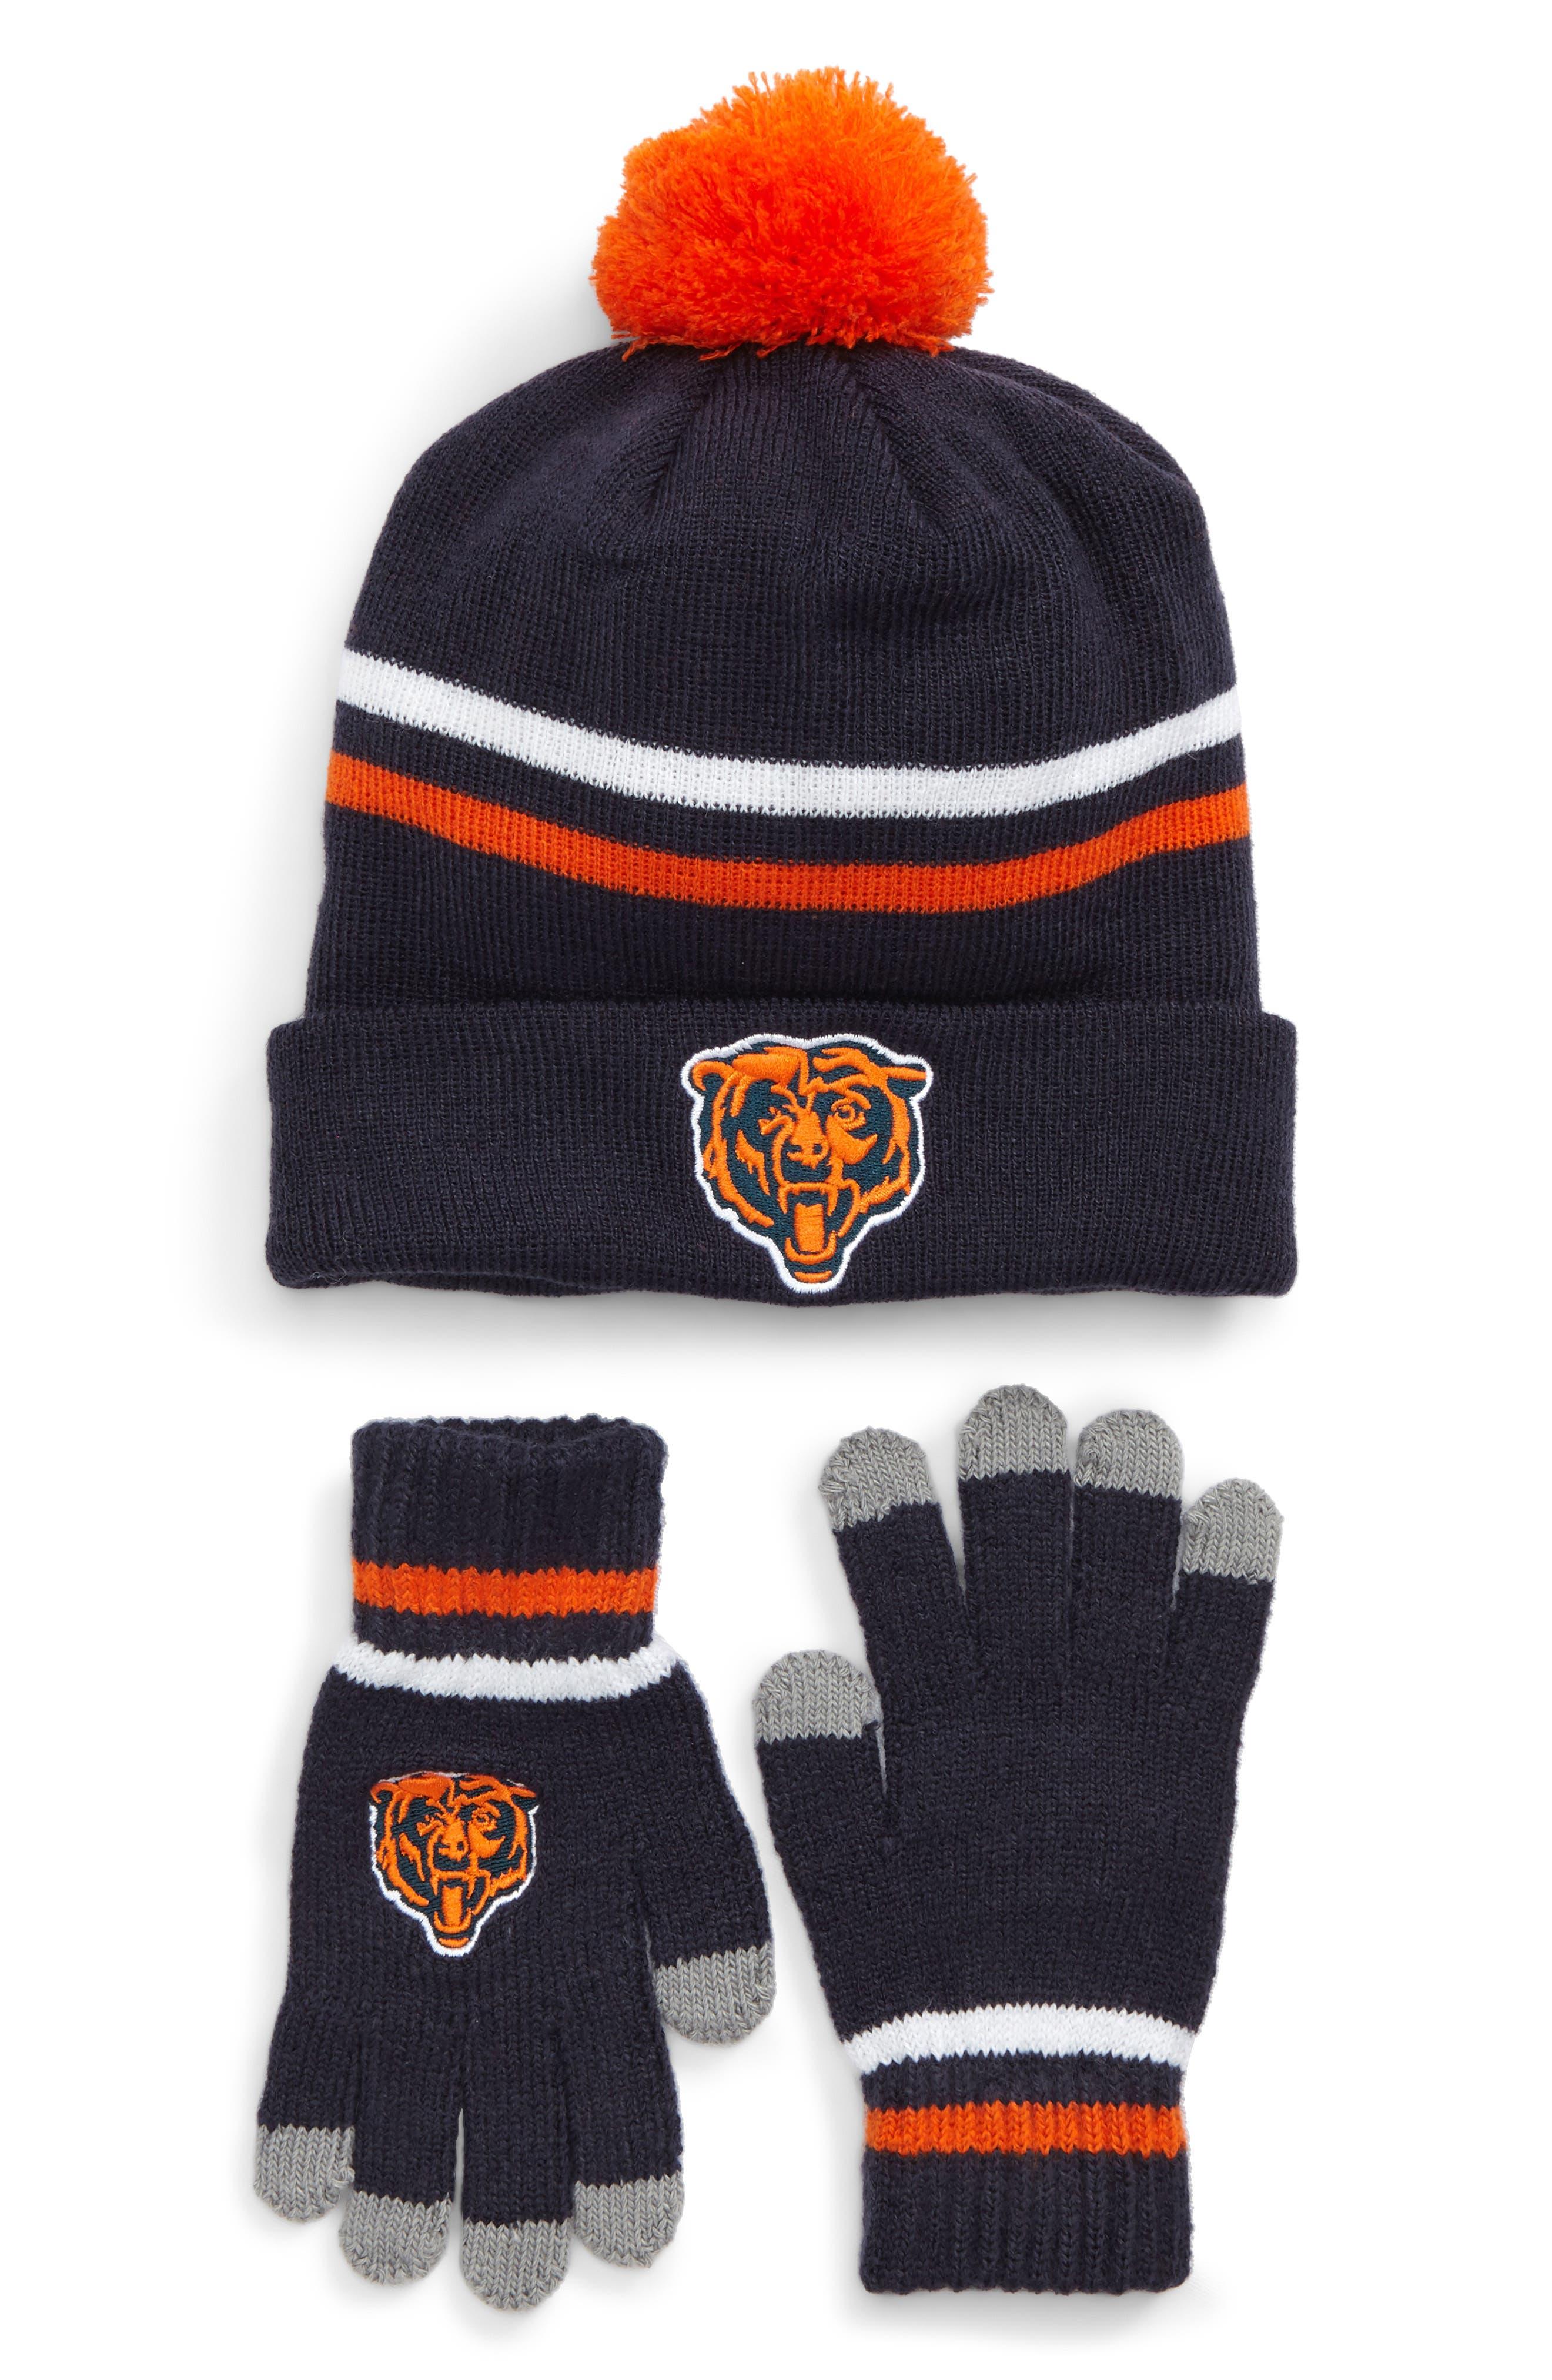 Main Image - Outerstuff NFL Logo Pom Beanie & Tech Gloves Set (Big Boys)